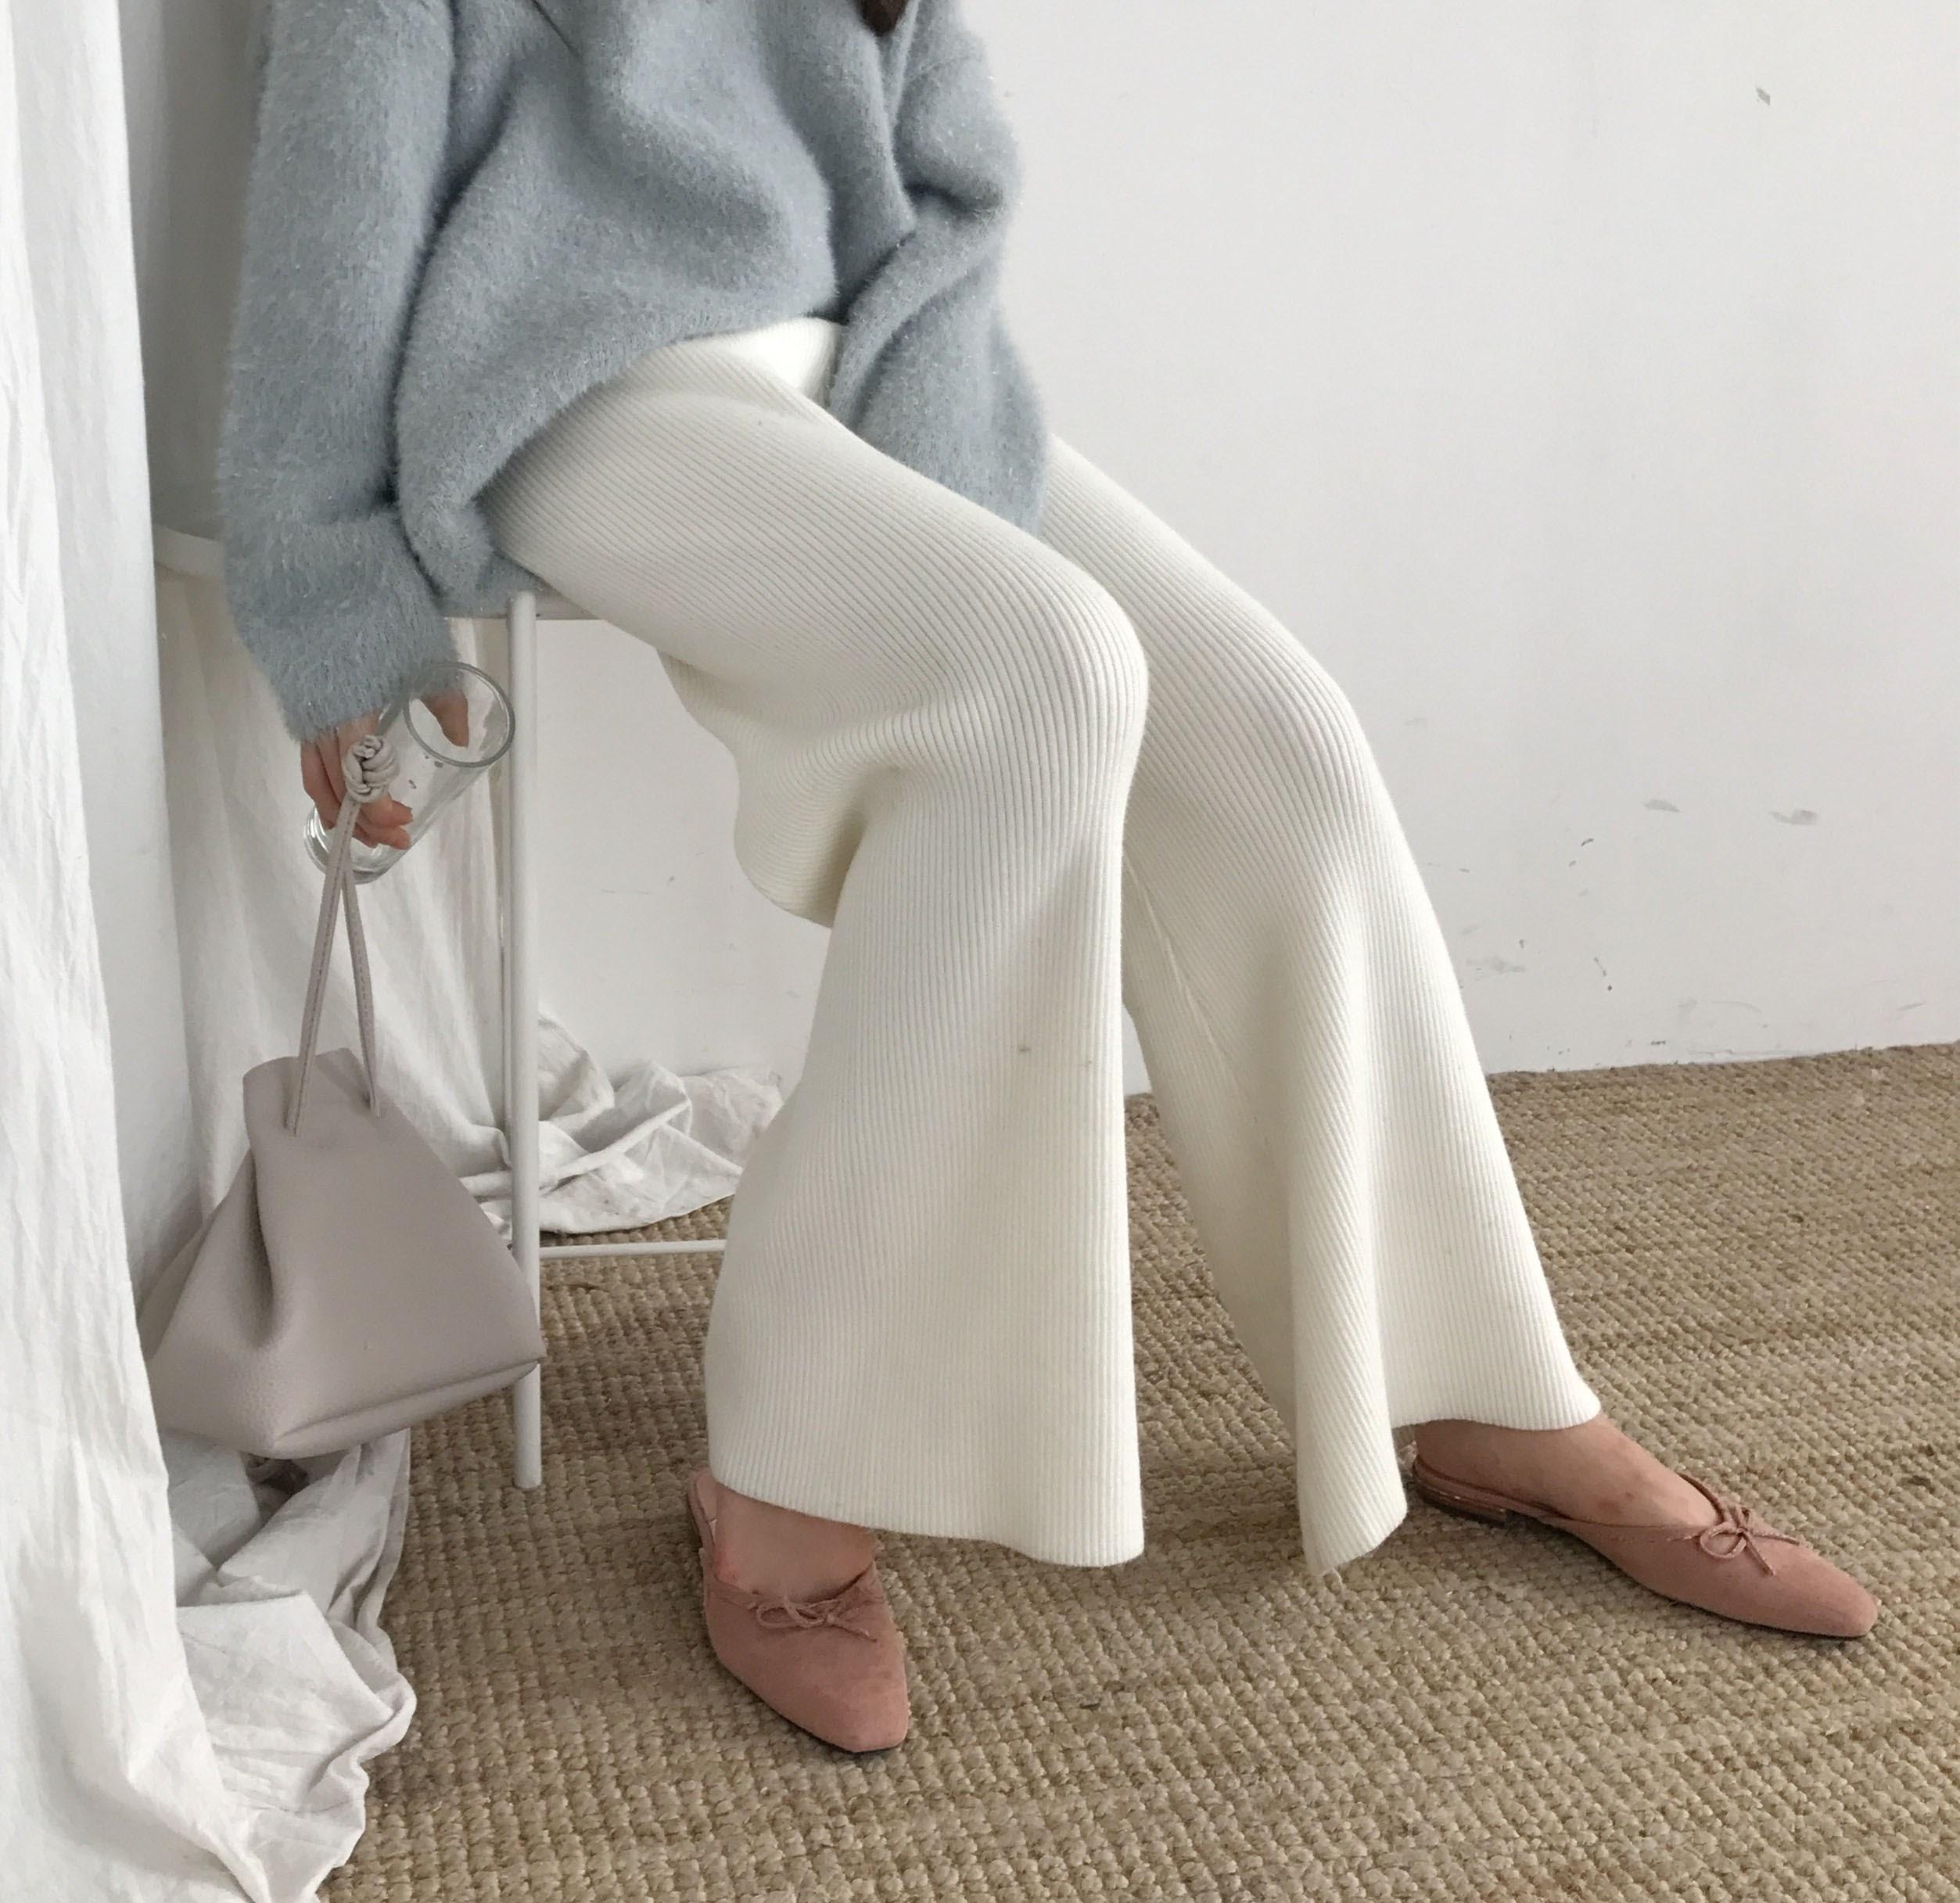 Autumn Winter Warm Jersey Knit Wide Leg Trousers Women High Waist   Pants   femme Casual   Pants   pantalon